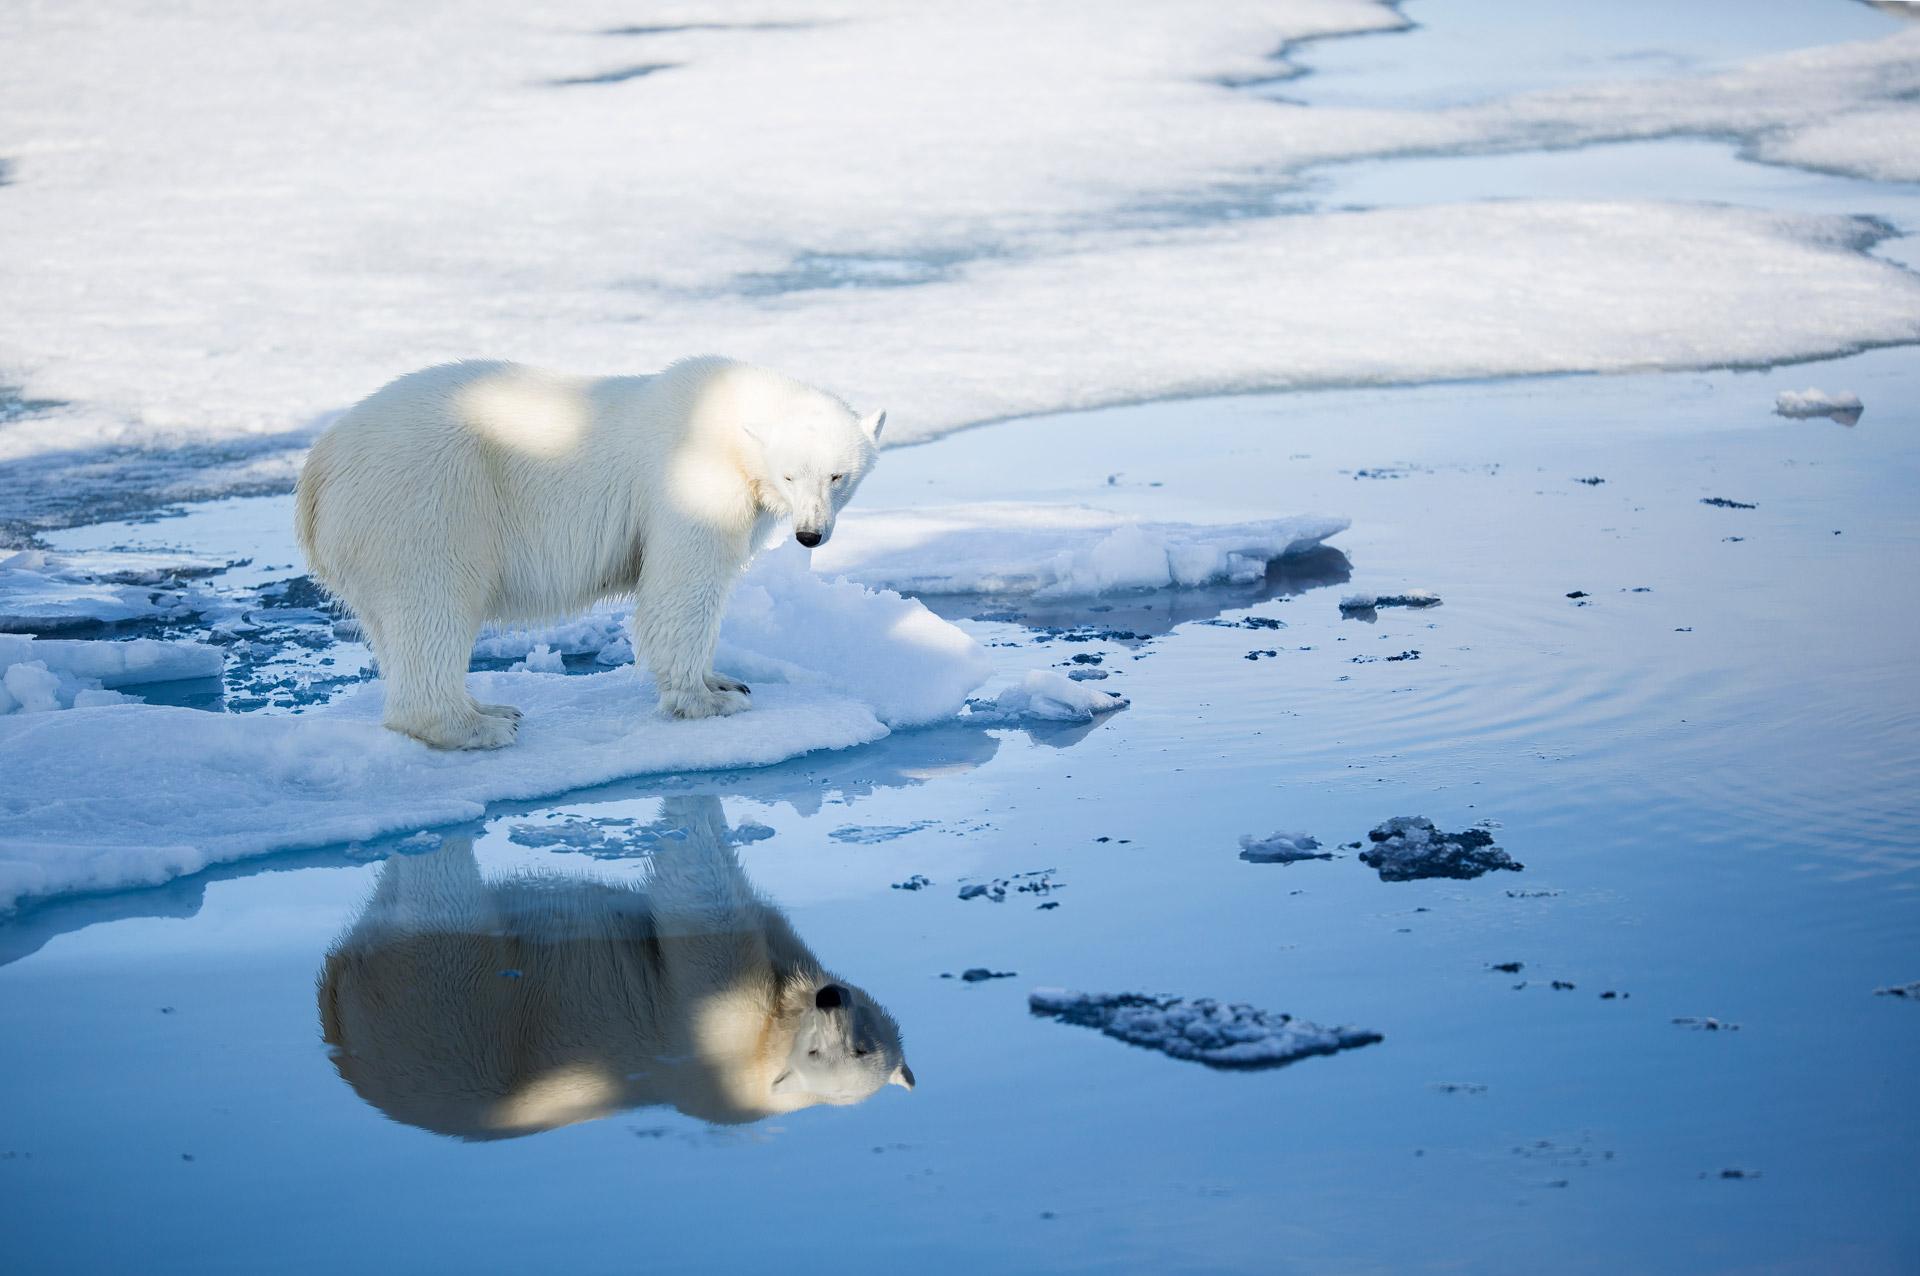 Svalbard polar bear_Aars August 2015-NP058930_press release